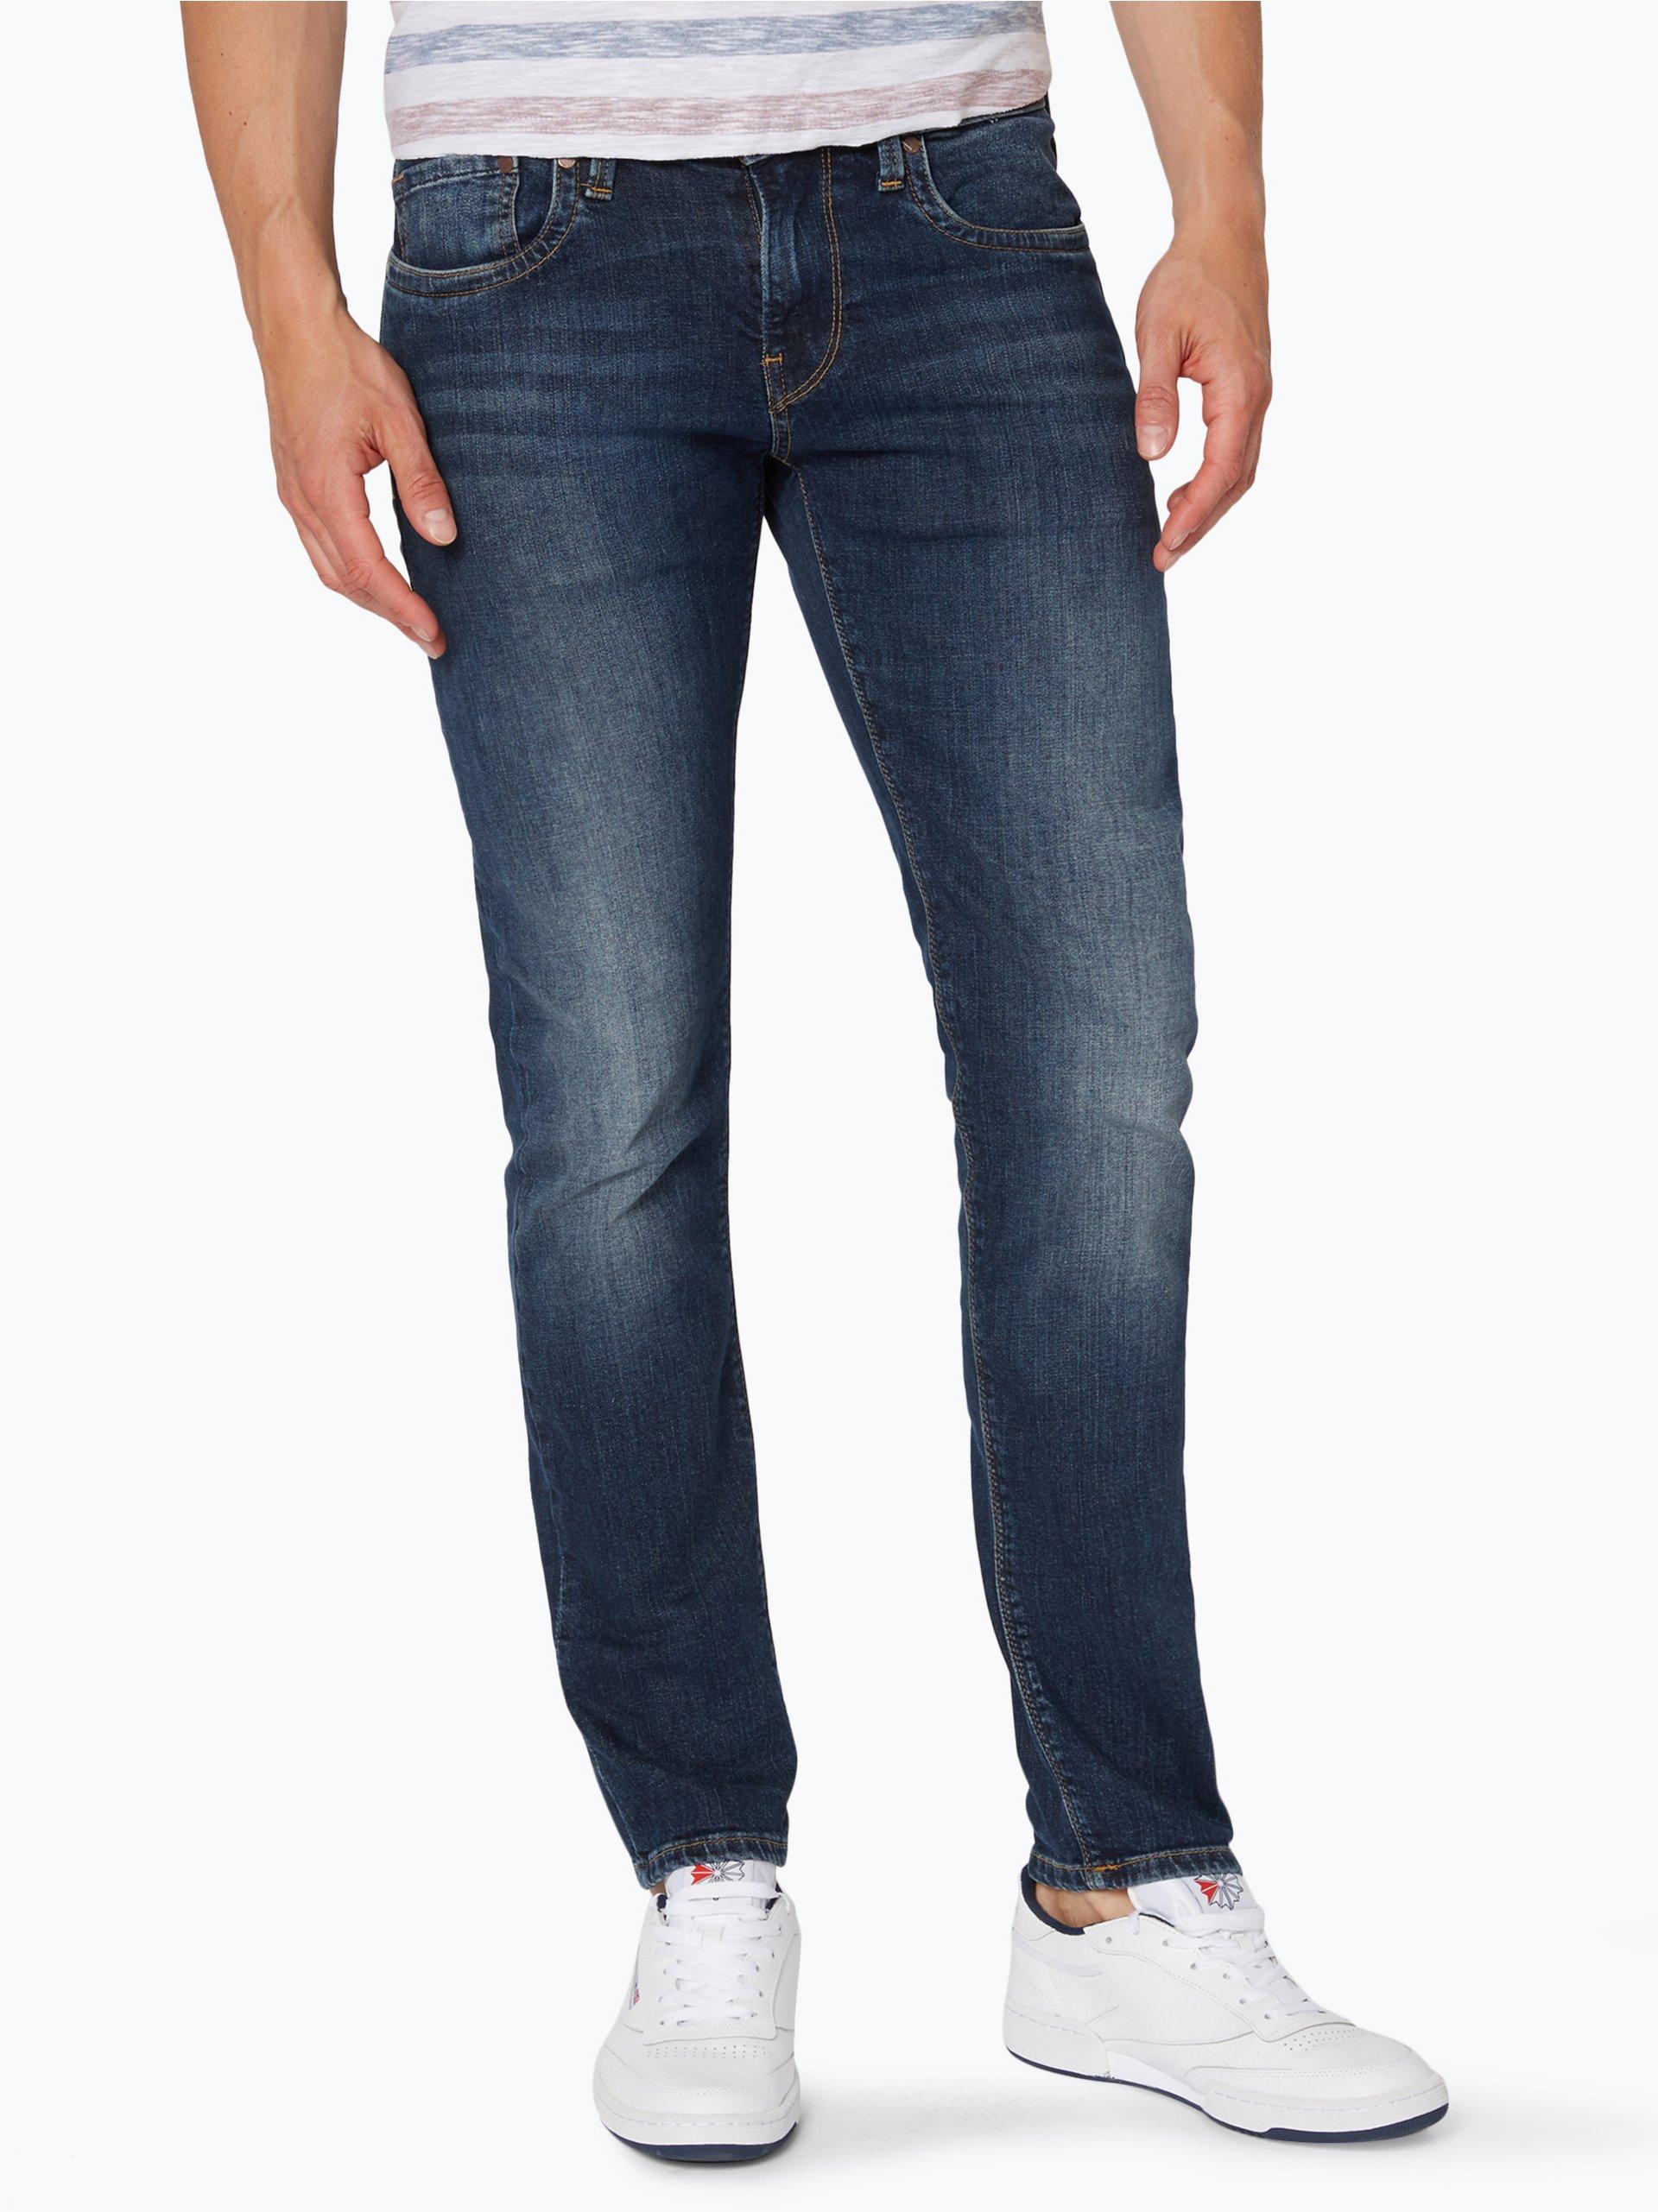 pepe jeans herren jeans hatch dark stone uni online kaufen vangraaf com. Black Bedroom Furniture Sets. Home Design Ideas